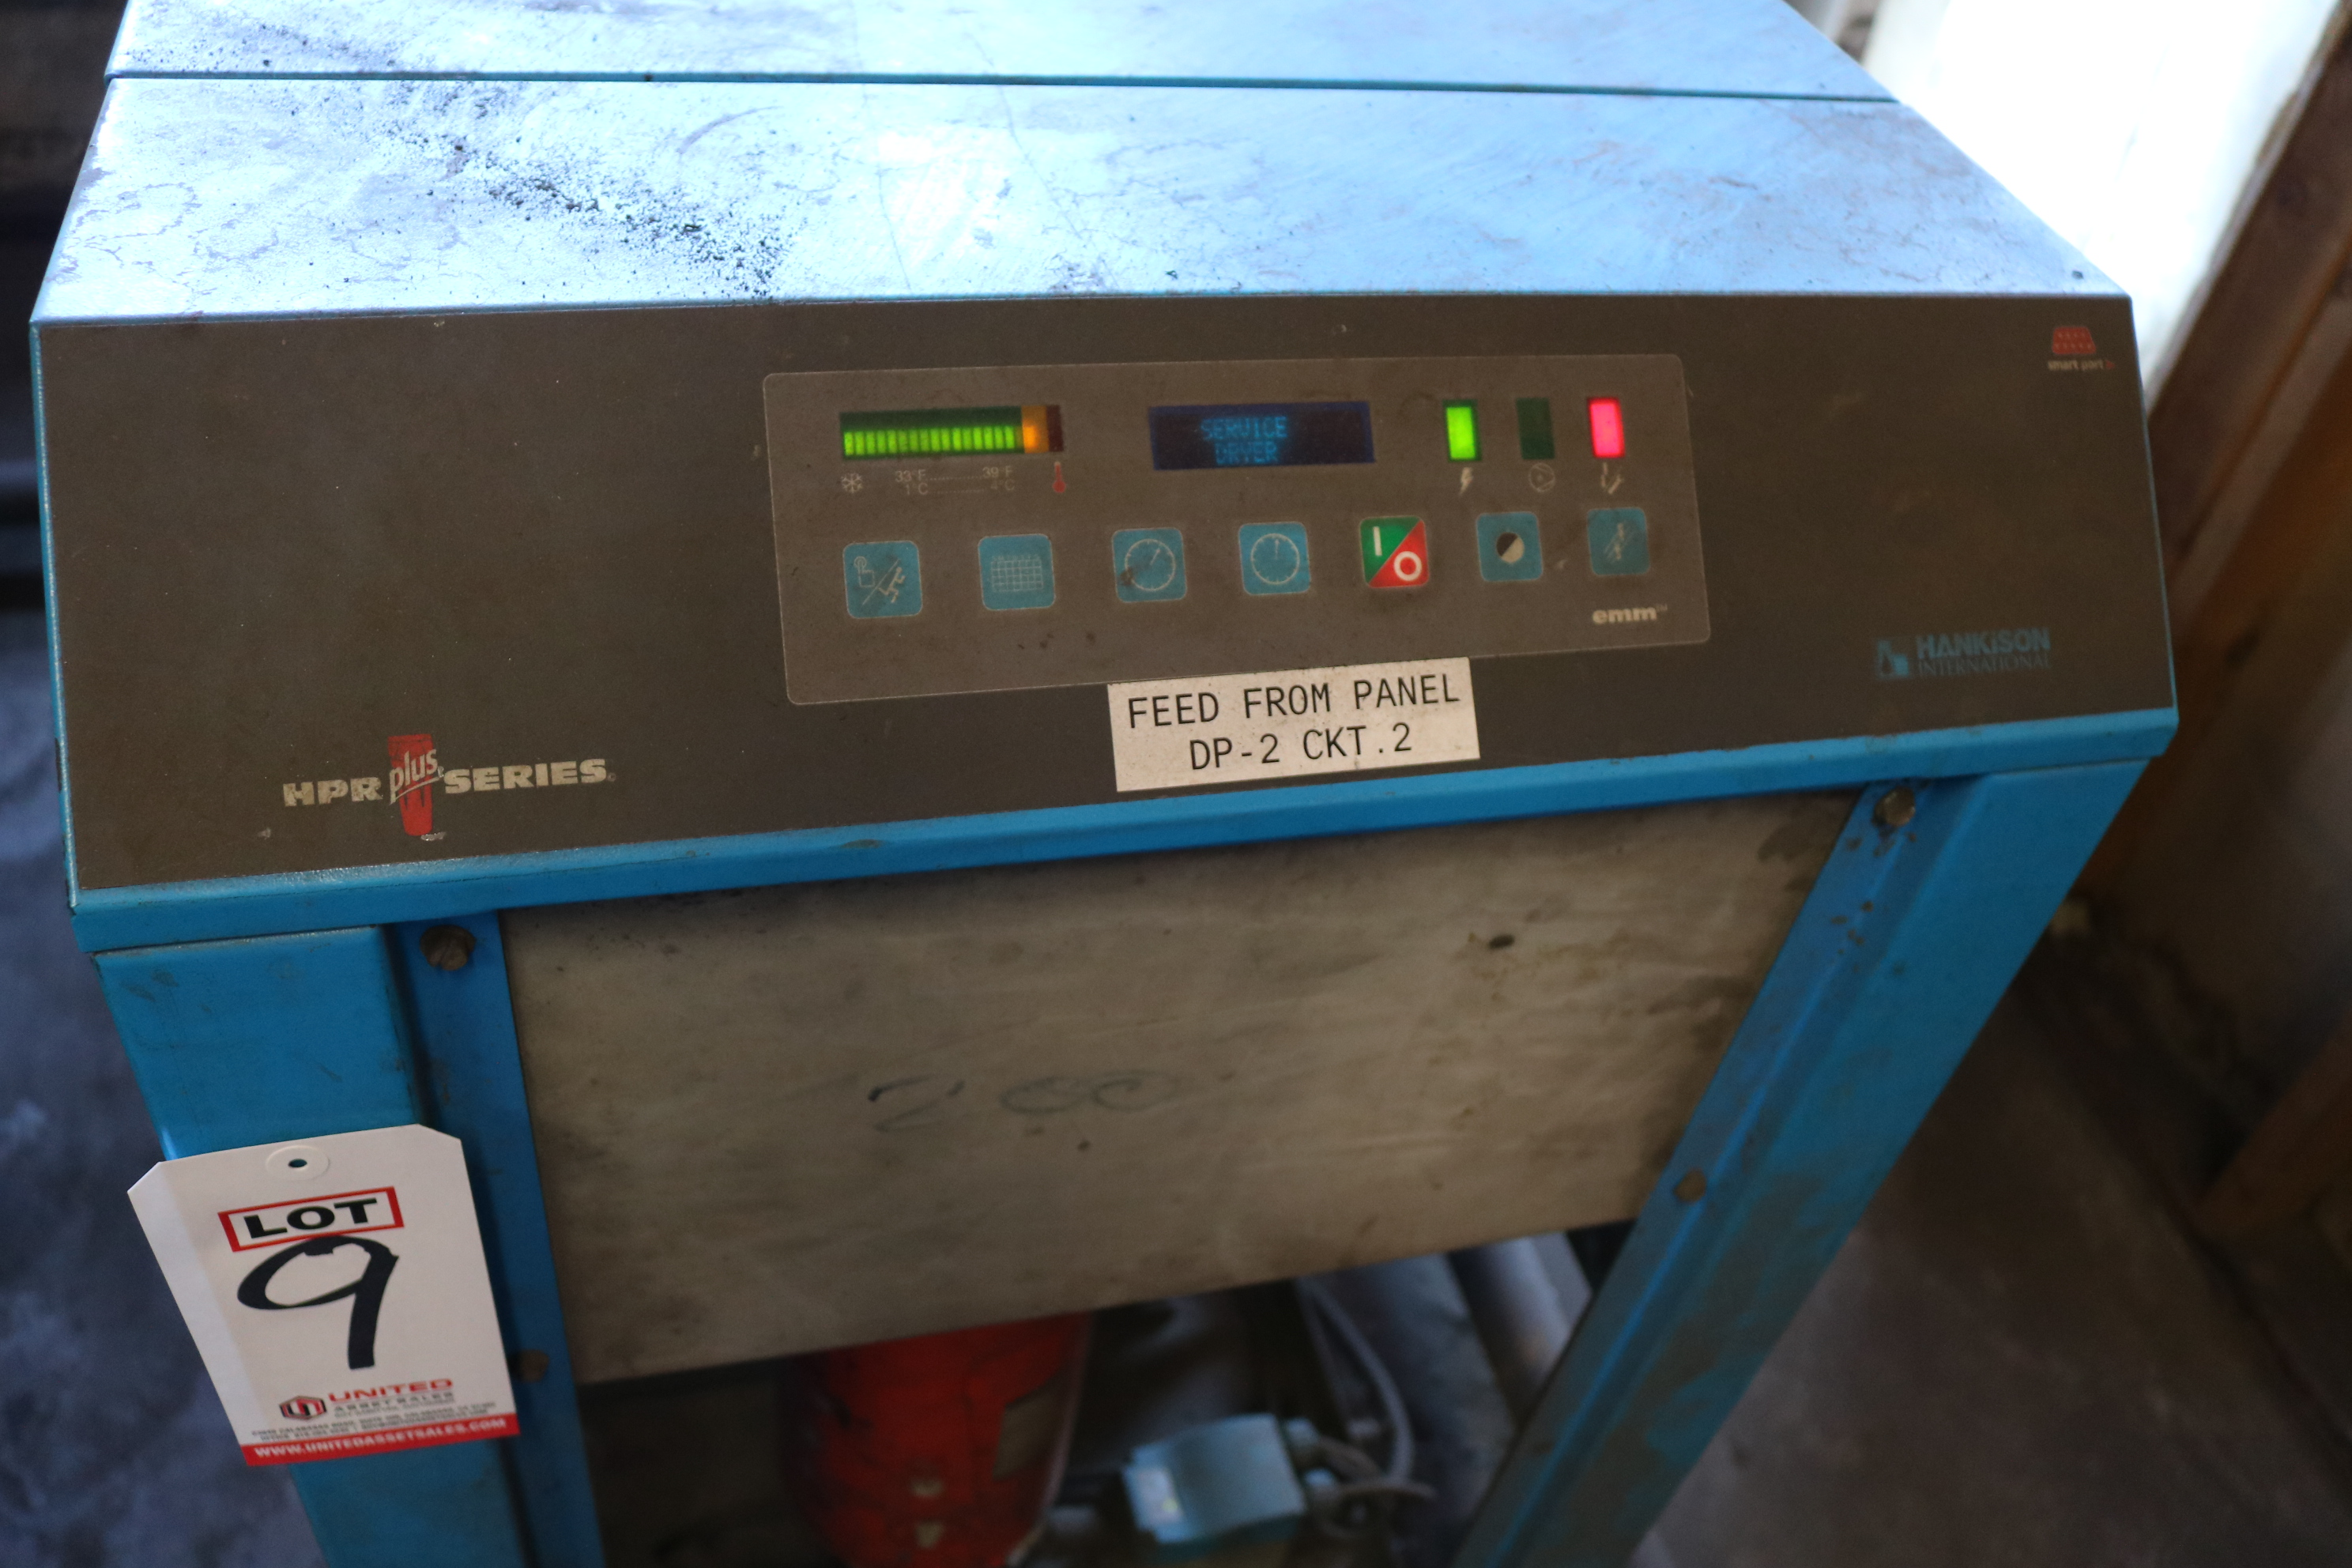 Lot 9 - HANKISON MODEL HPRP200-468 200 CFM AIR DRYER, S/N H200A46001100187